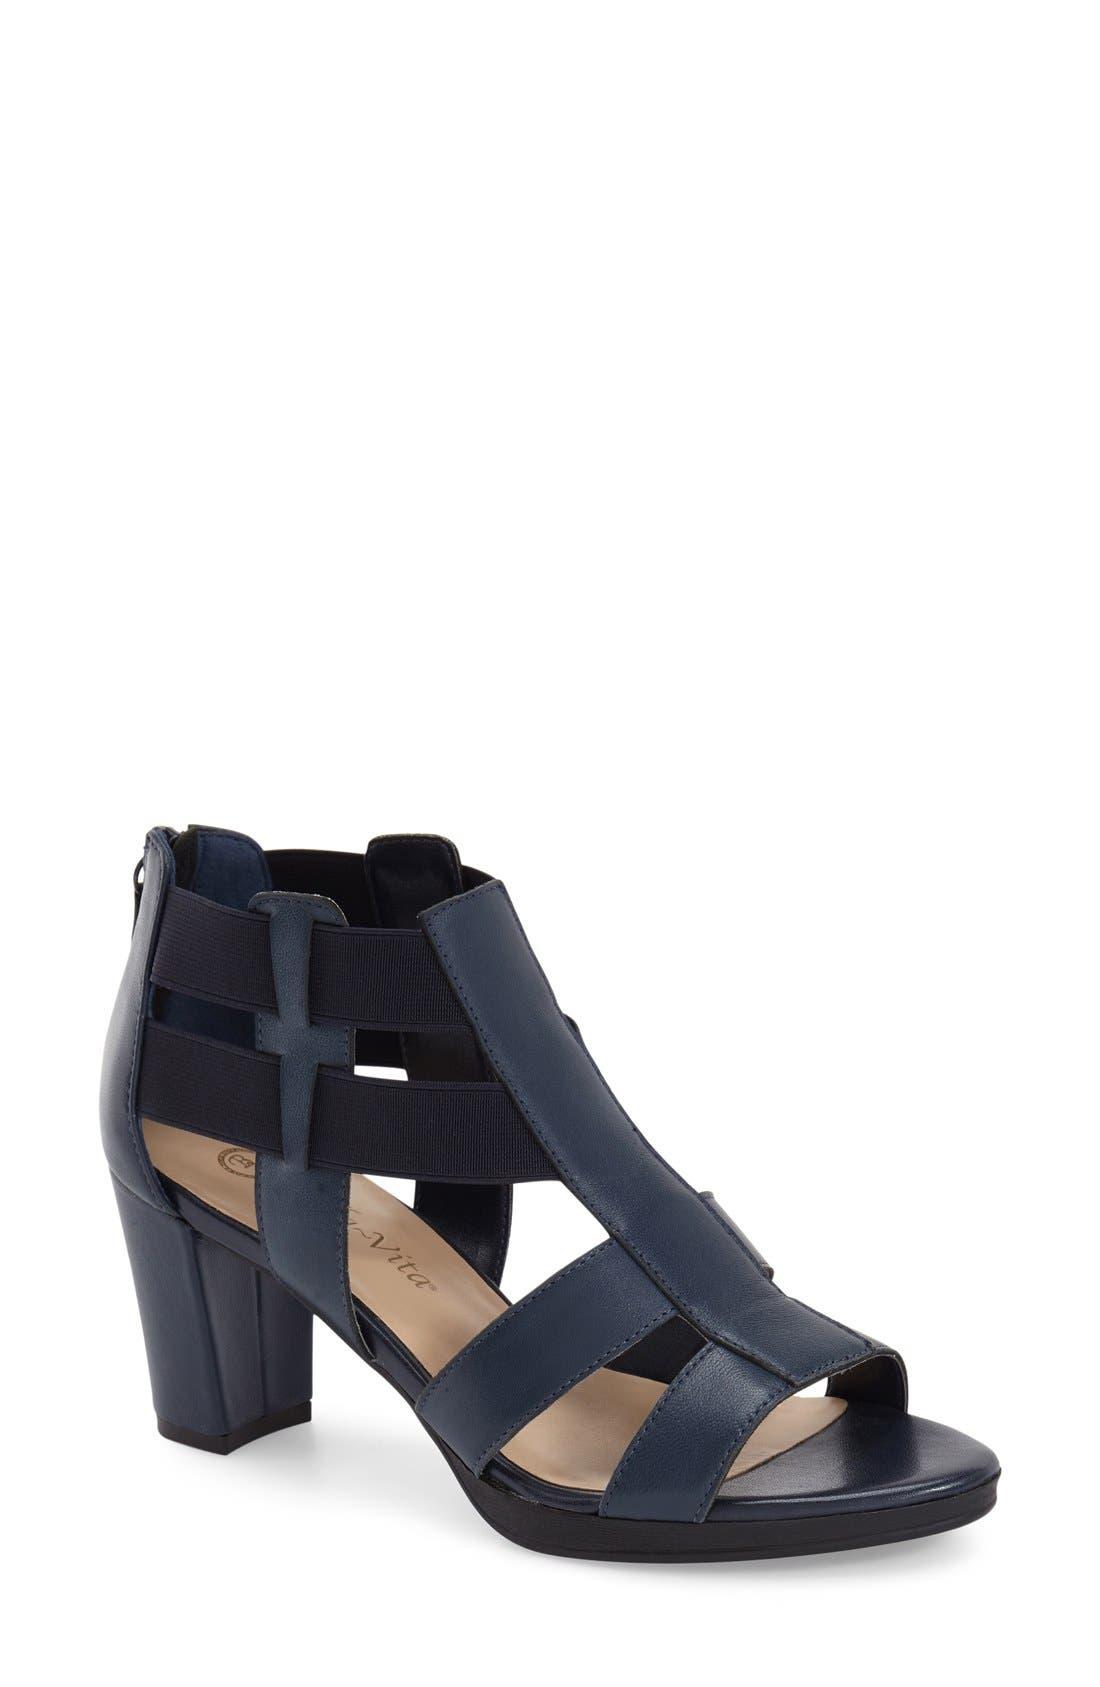 Main Image - Bella Vita 'Lincoln' Sandal (Women)